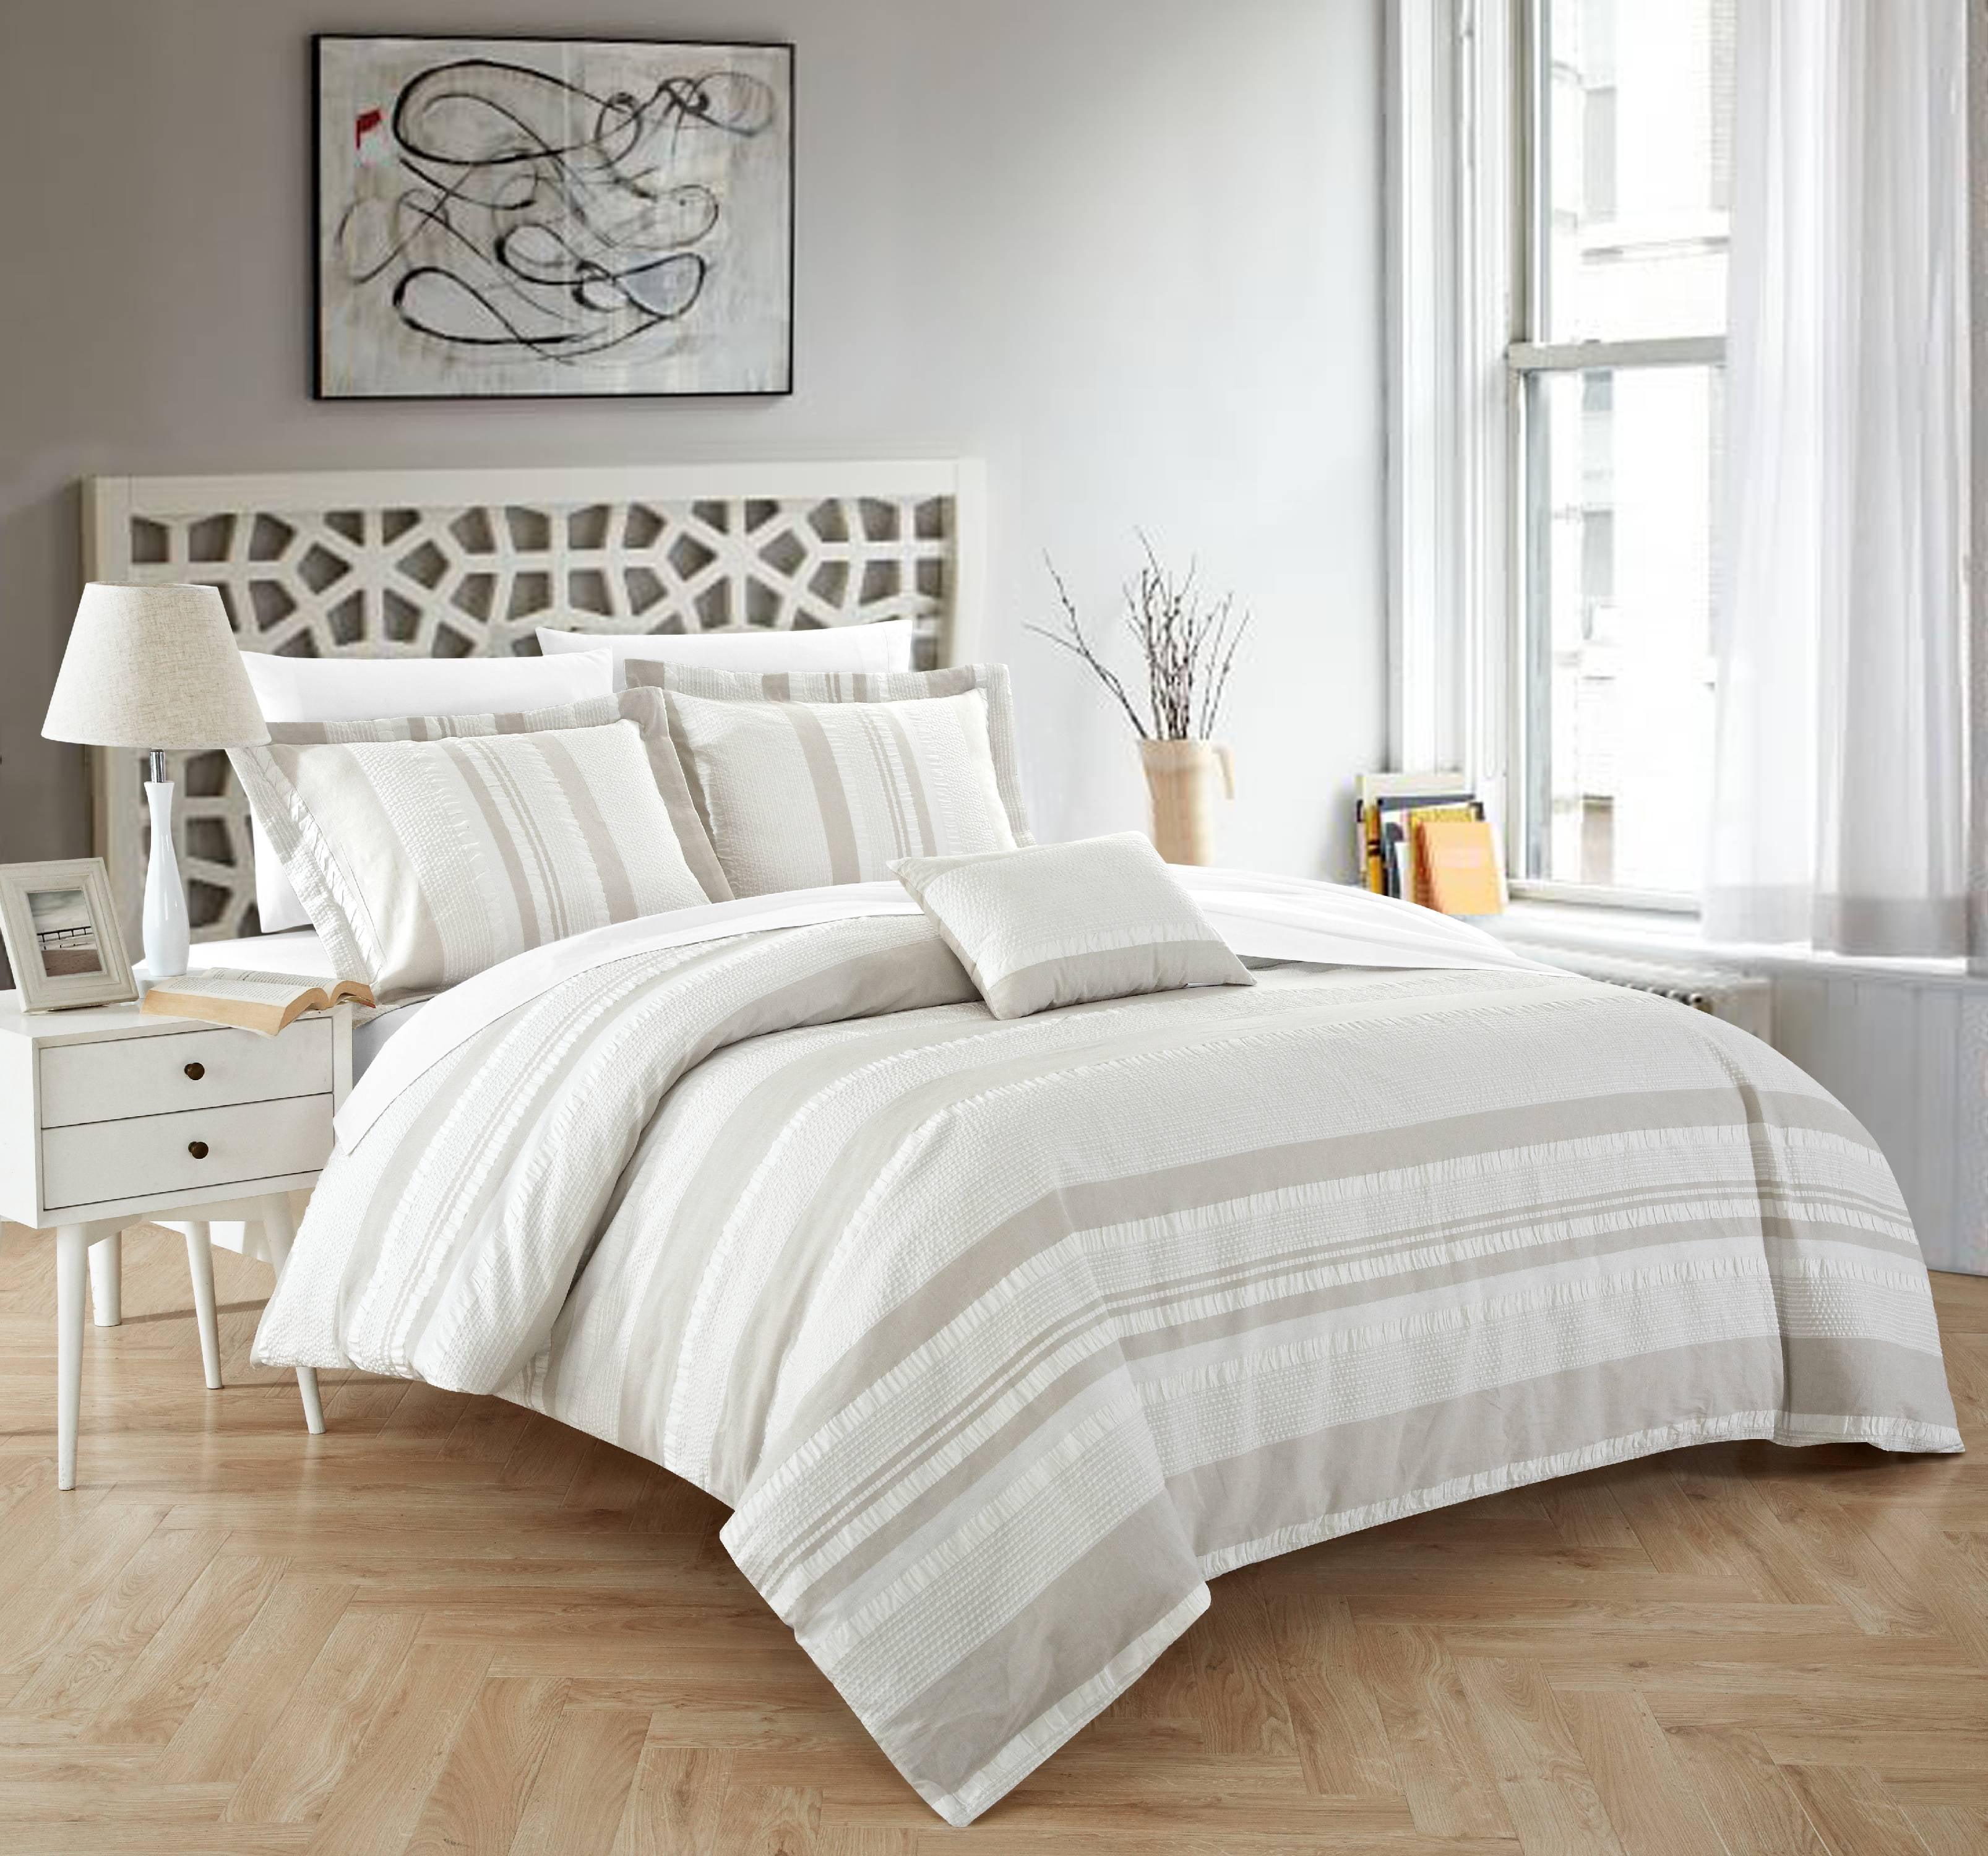 Chic Home Devon 4 Piece Duvet Cover Set 100% Cotton Seersucker Striped Design Zipper Closure Bedding with Decorative Pillows Shams Included, King Beige